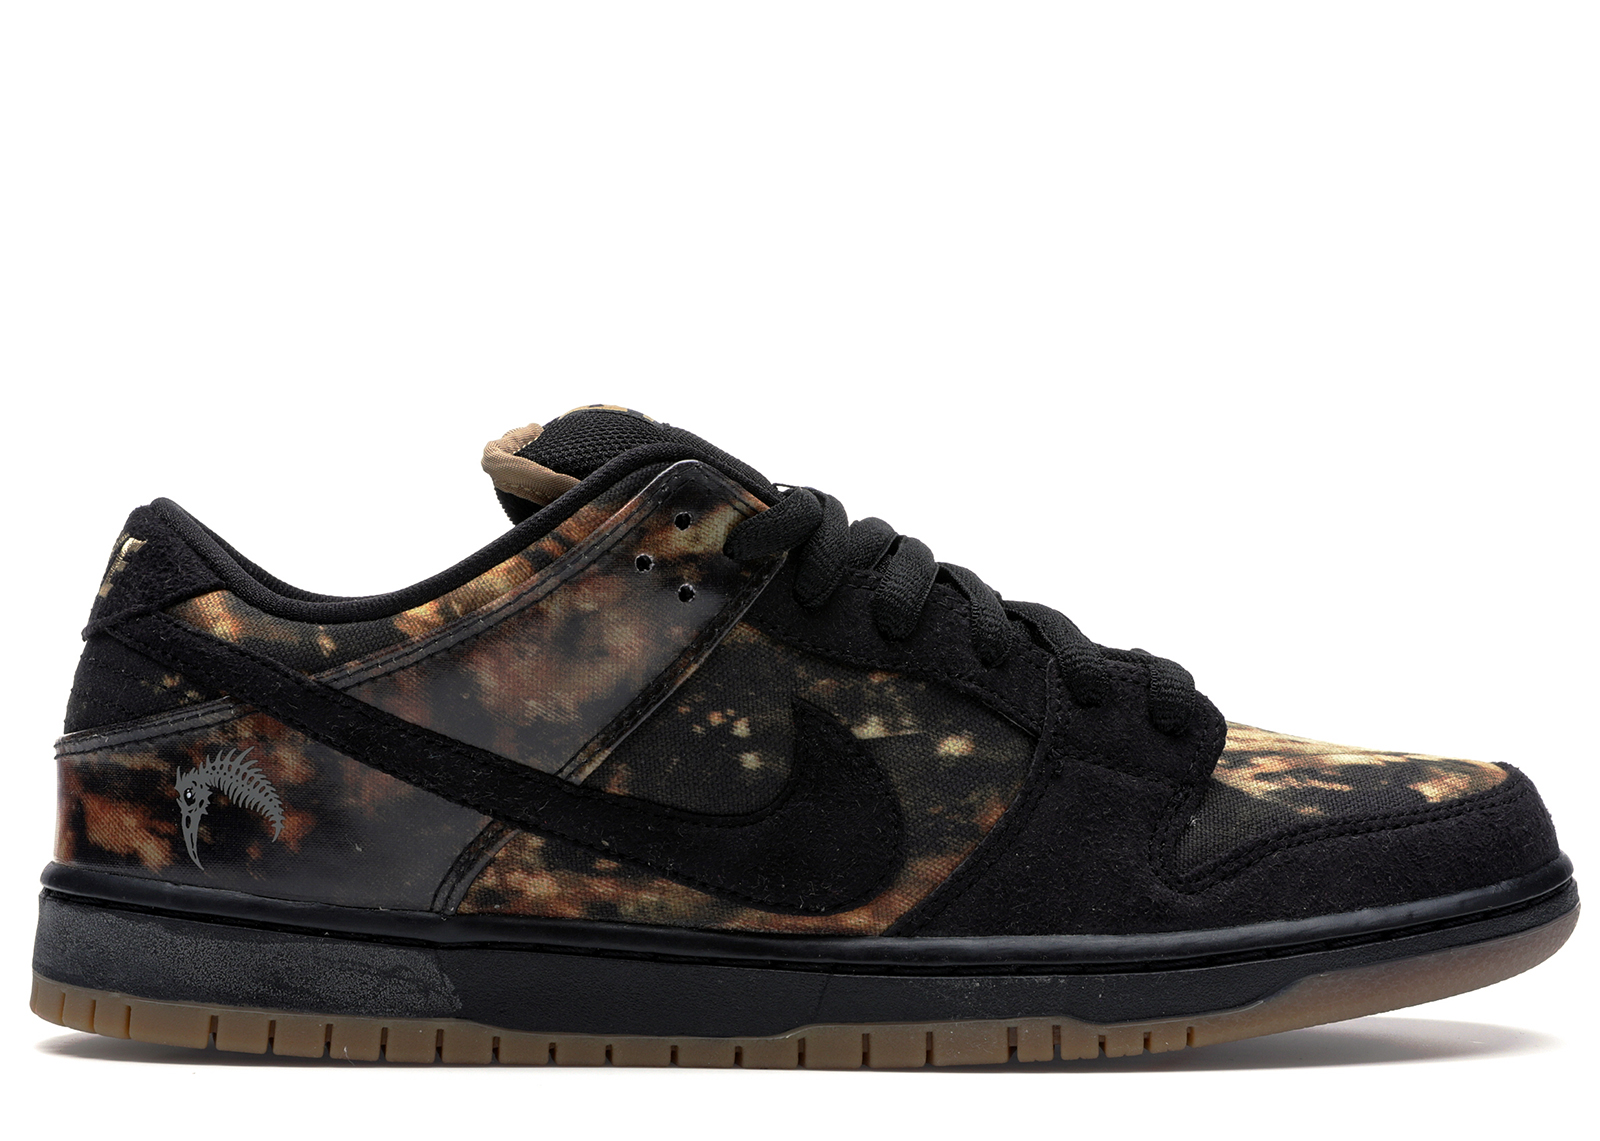 Nike Dunk SB Low Pushead 2 - 536356-002